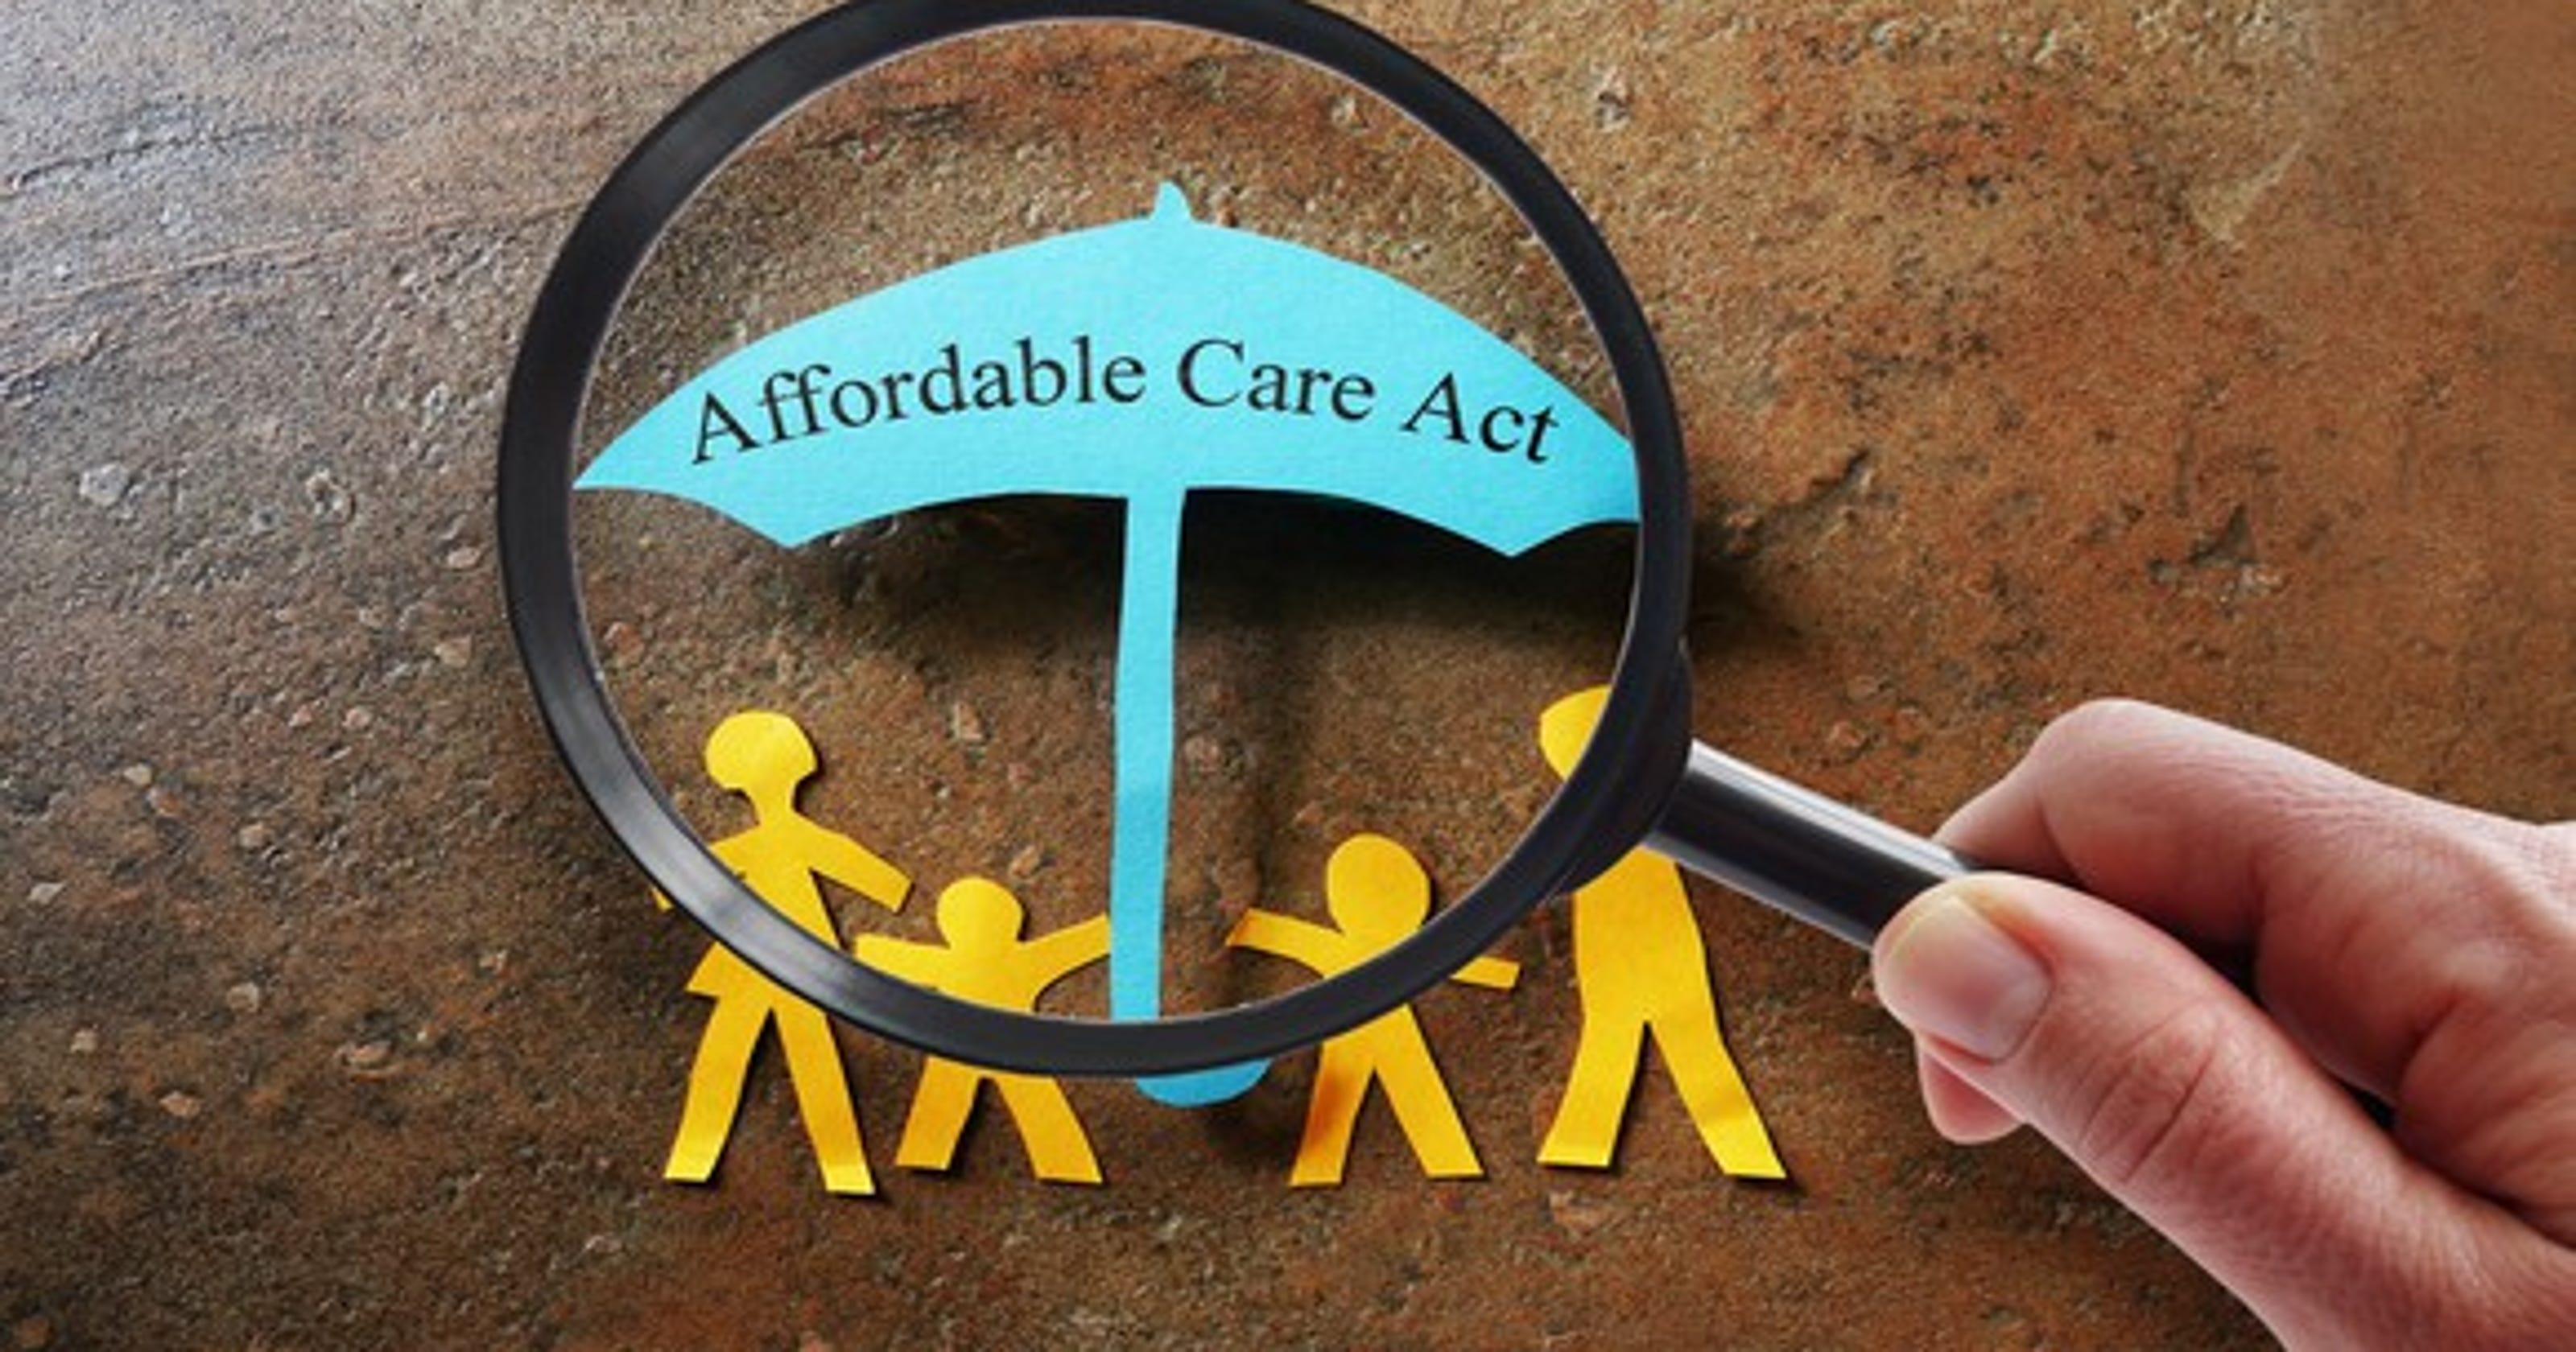 ACA health insurance open enrollment 2019 in Tenn : What's